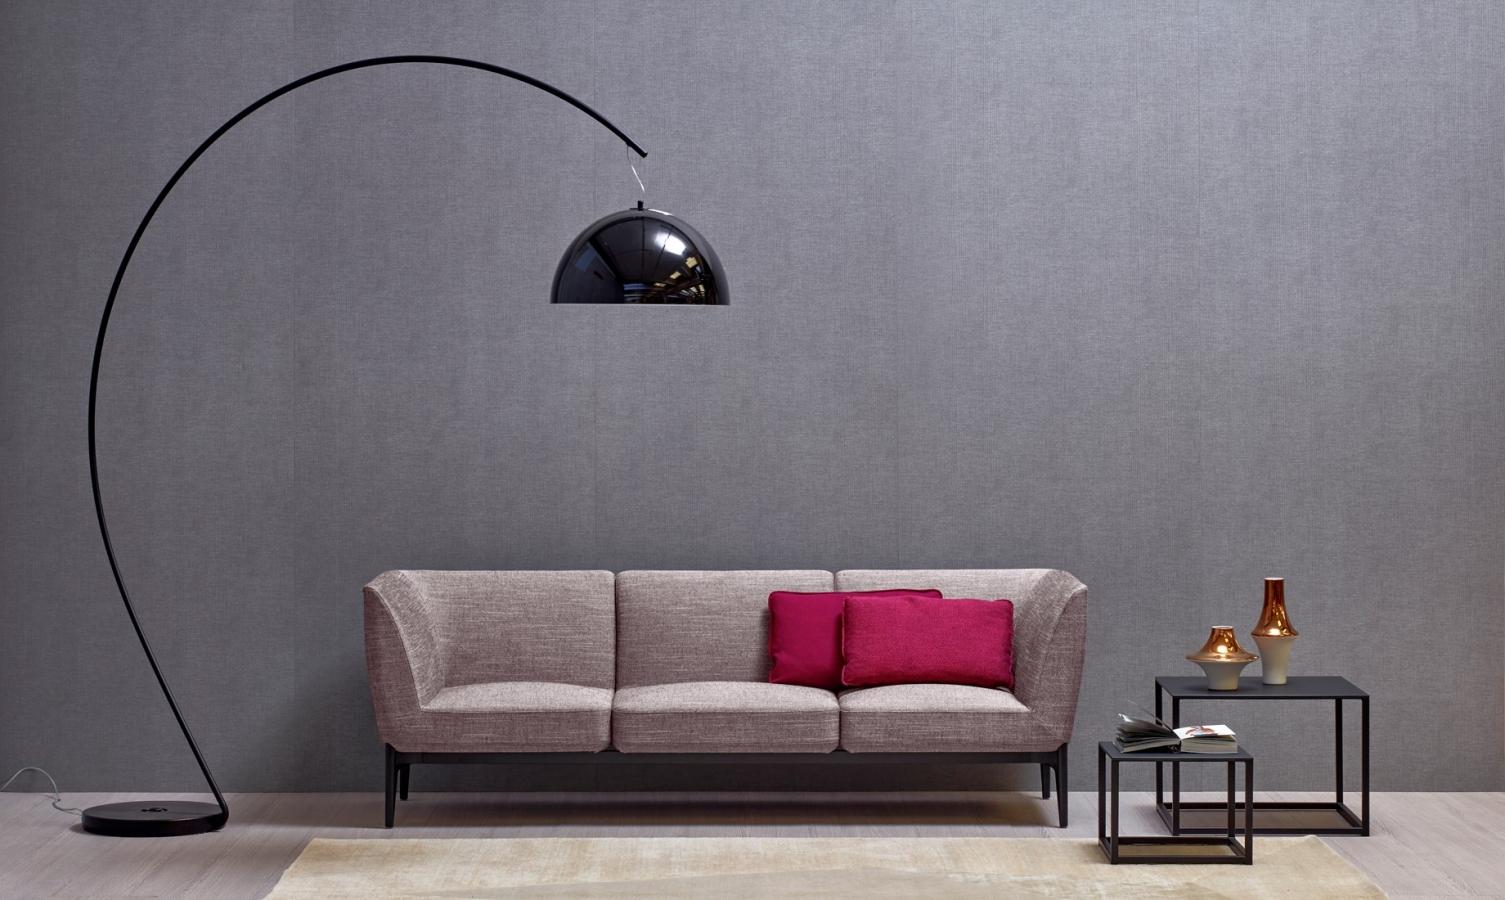 Salon Noir Blanc Jaune lampadaires excentré l002t alberto basaglia pedrali design